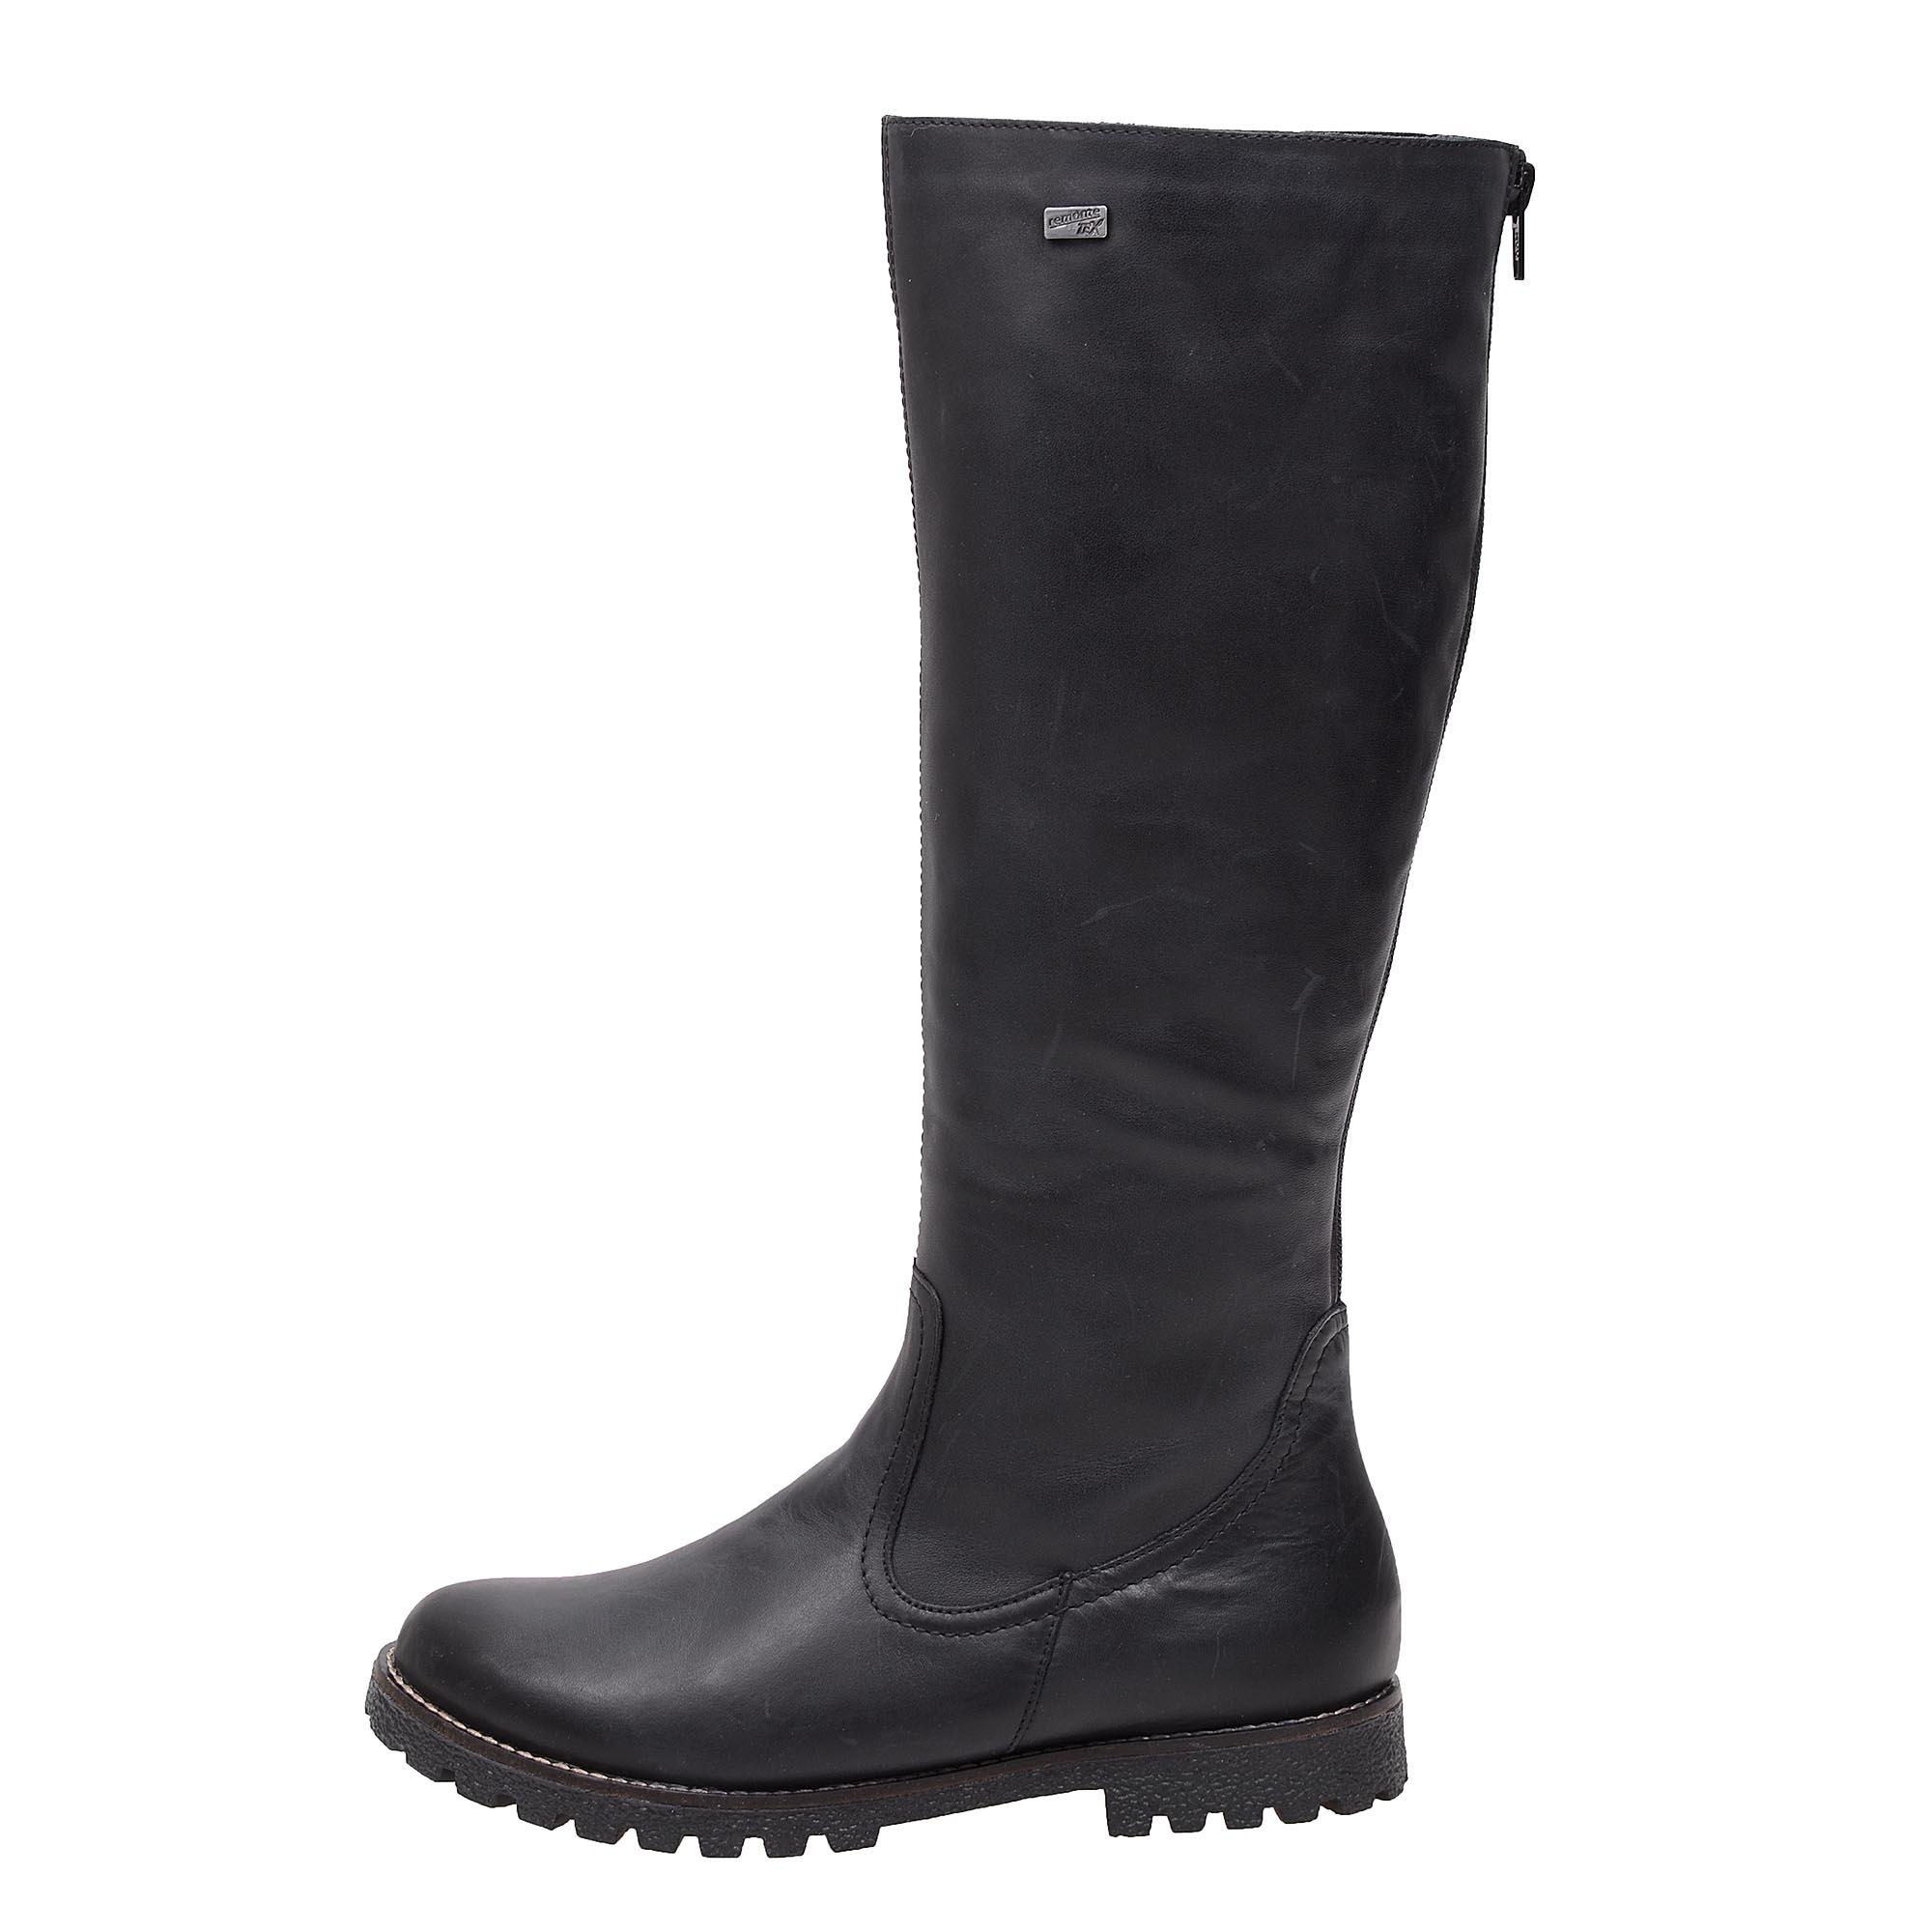 detail Dámská obuv REMONTE - RIEKER R4276 15 BLAU H W 7 1b54c017fea